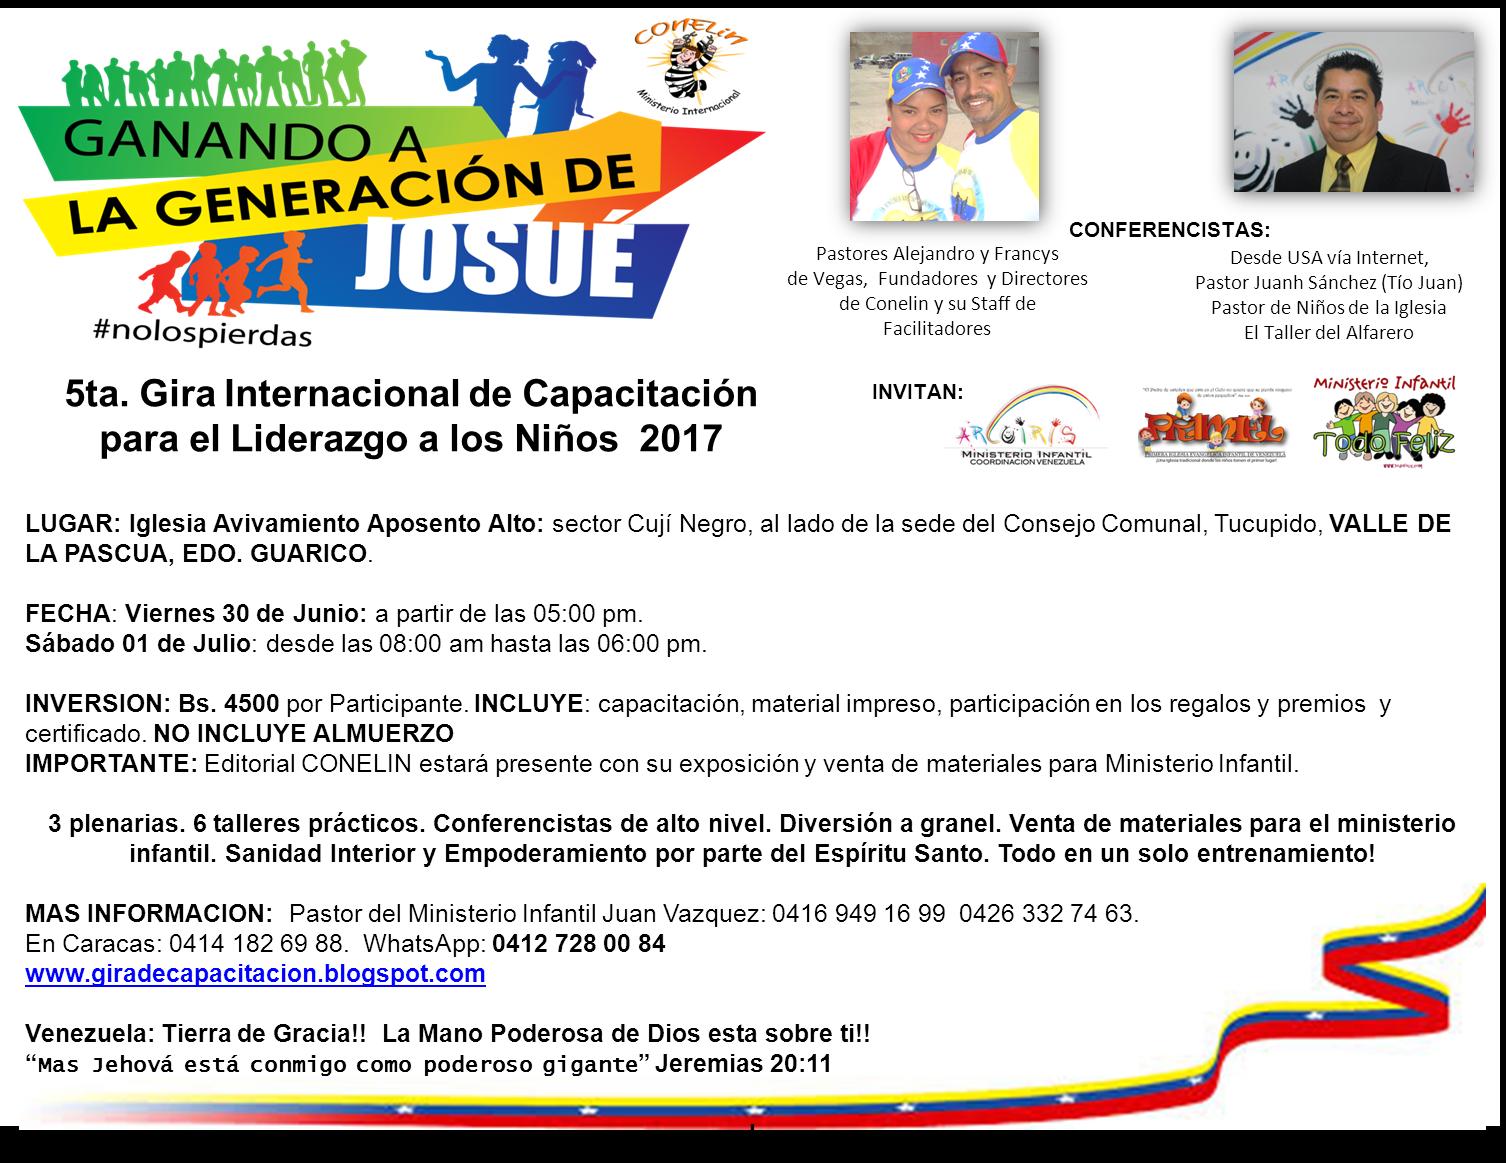 Ministerio internacional conelin de venezuela for Ministerio de inter